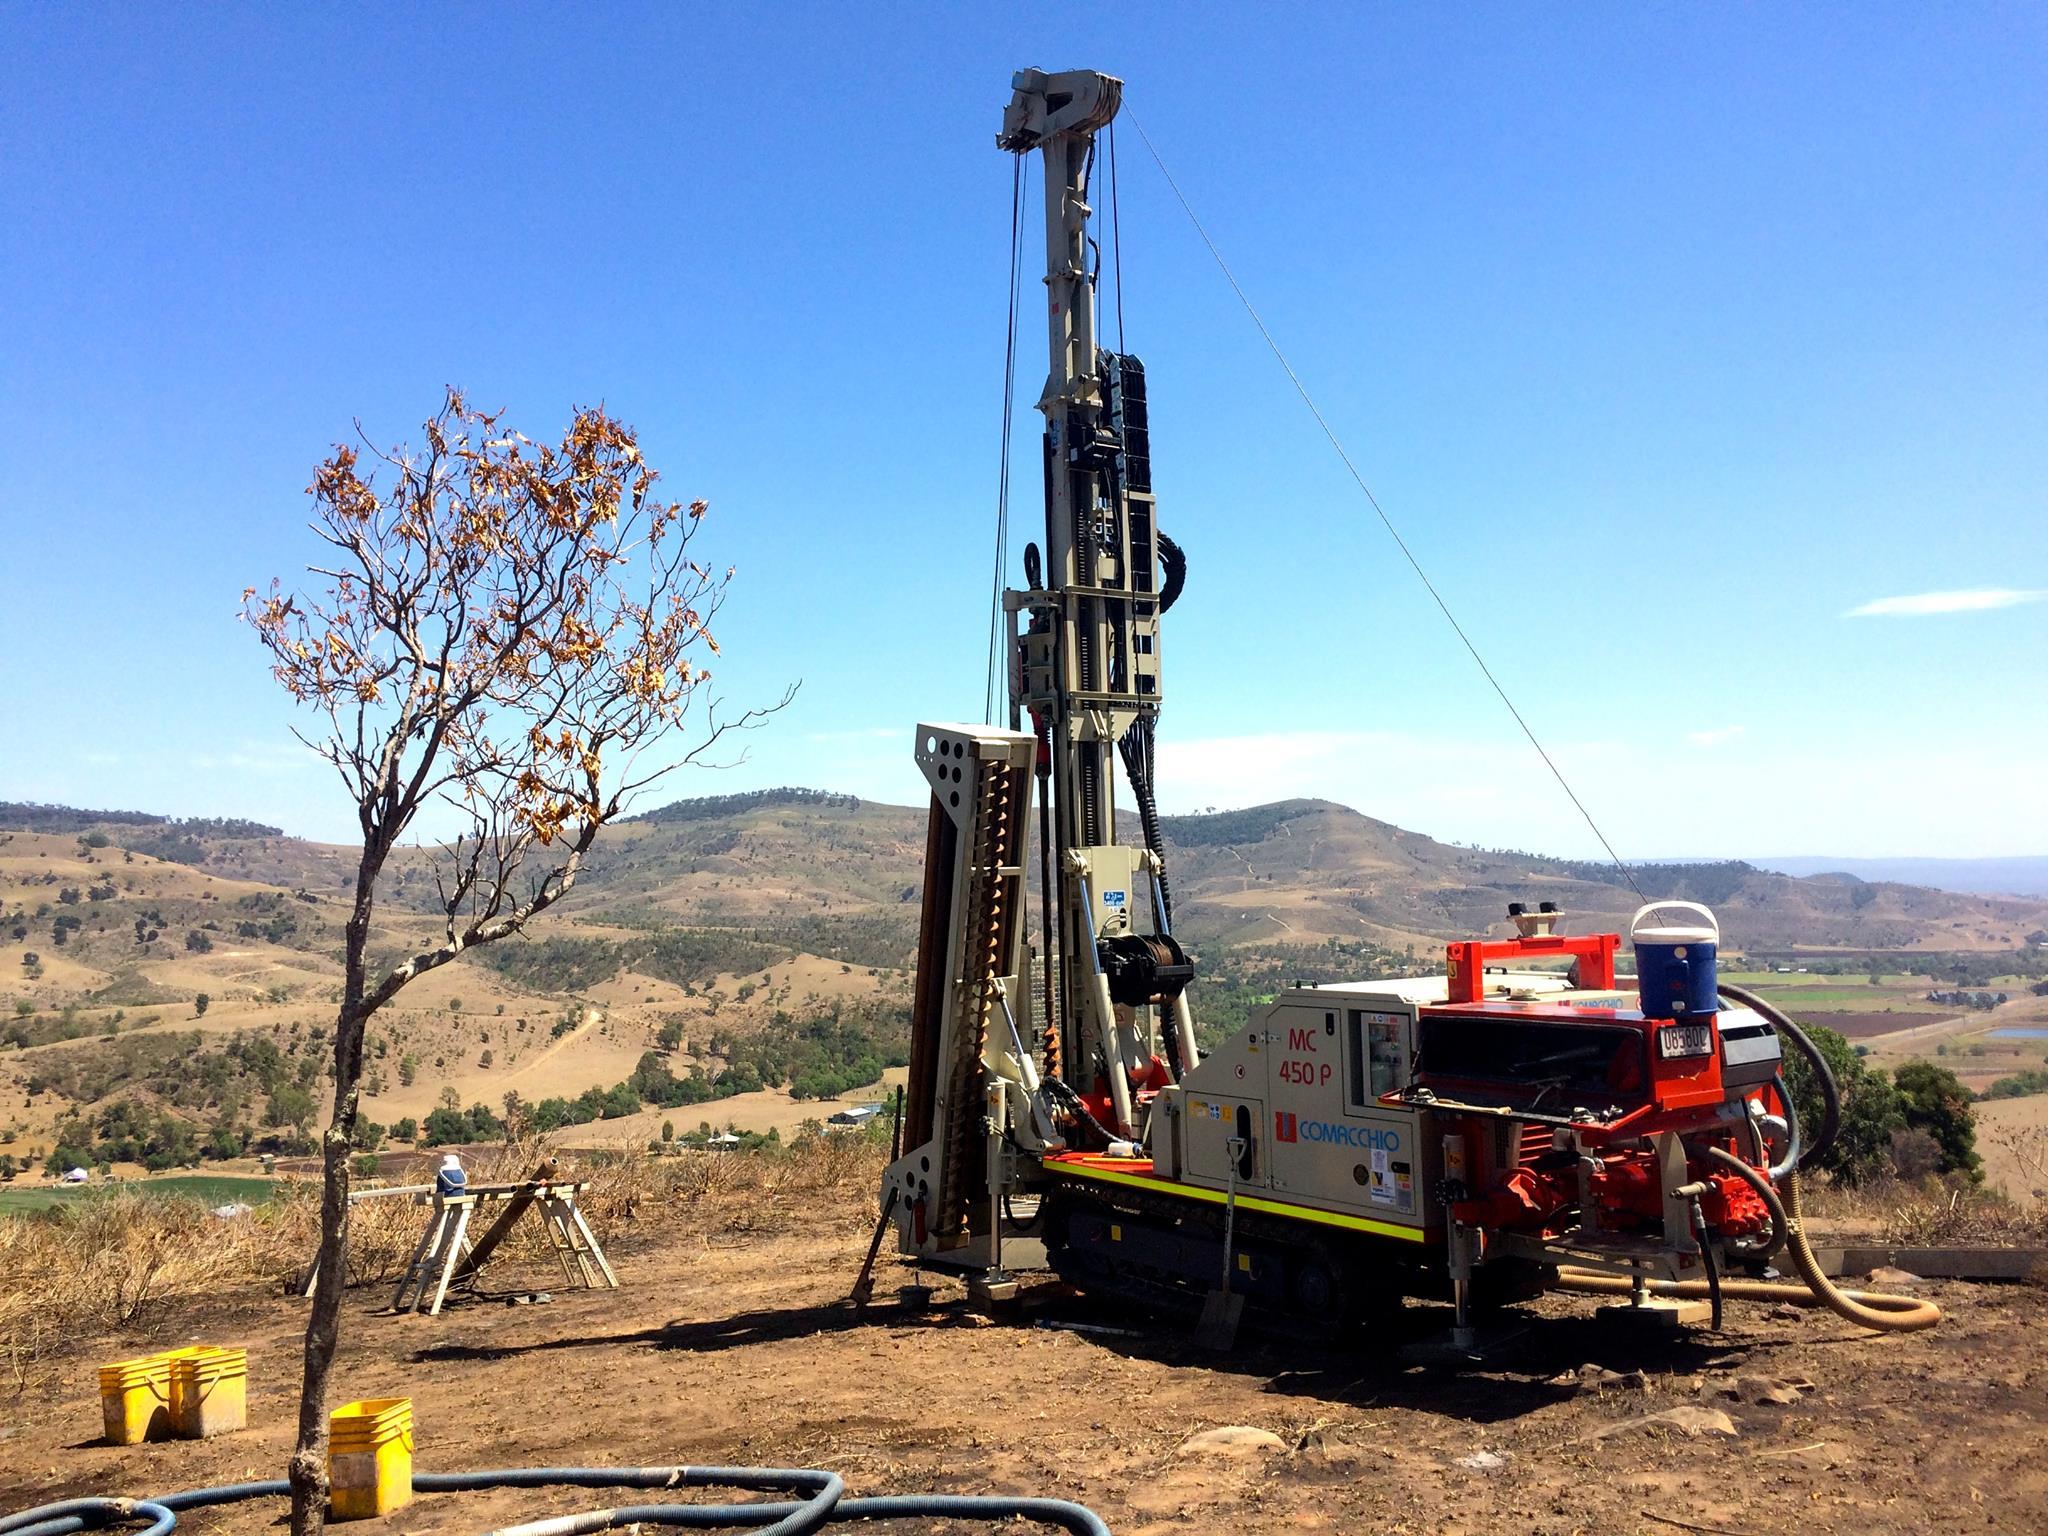 Hinterland_Drilling_2